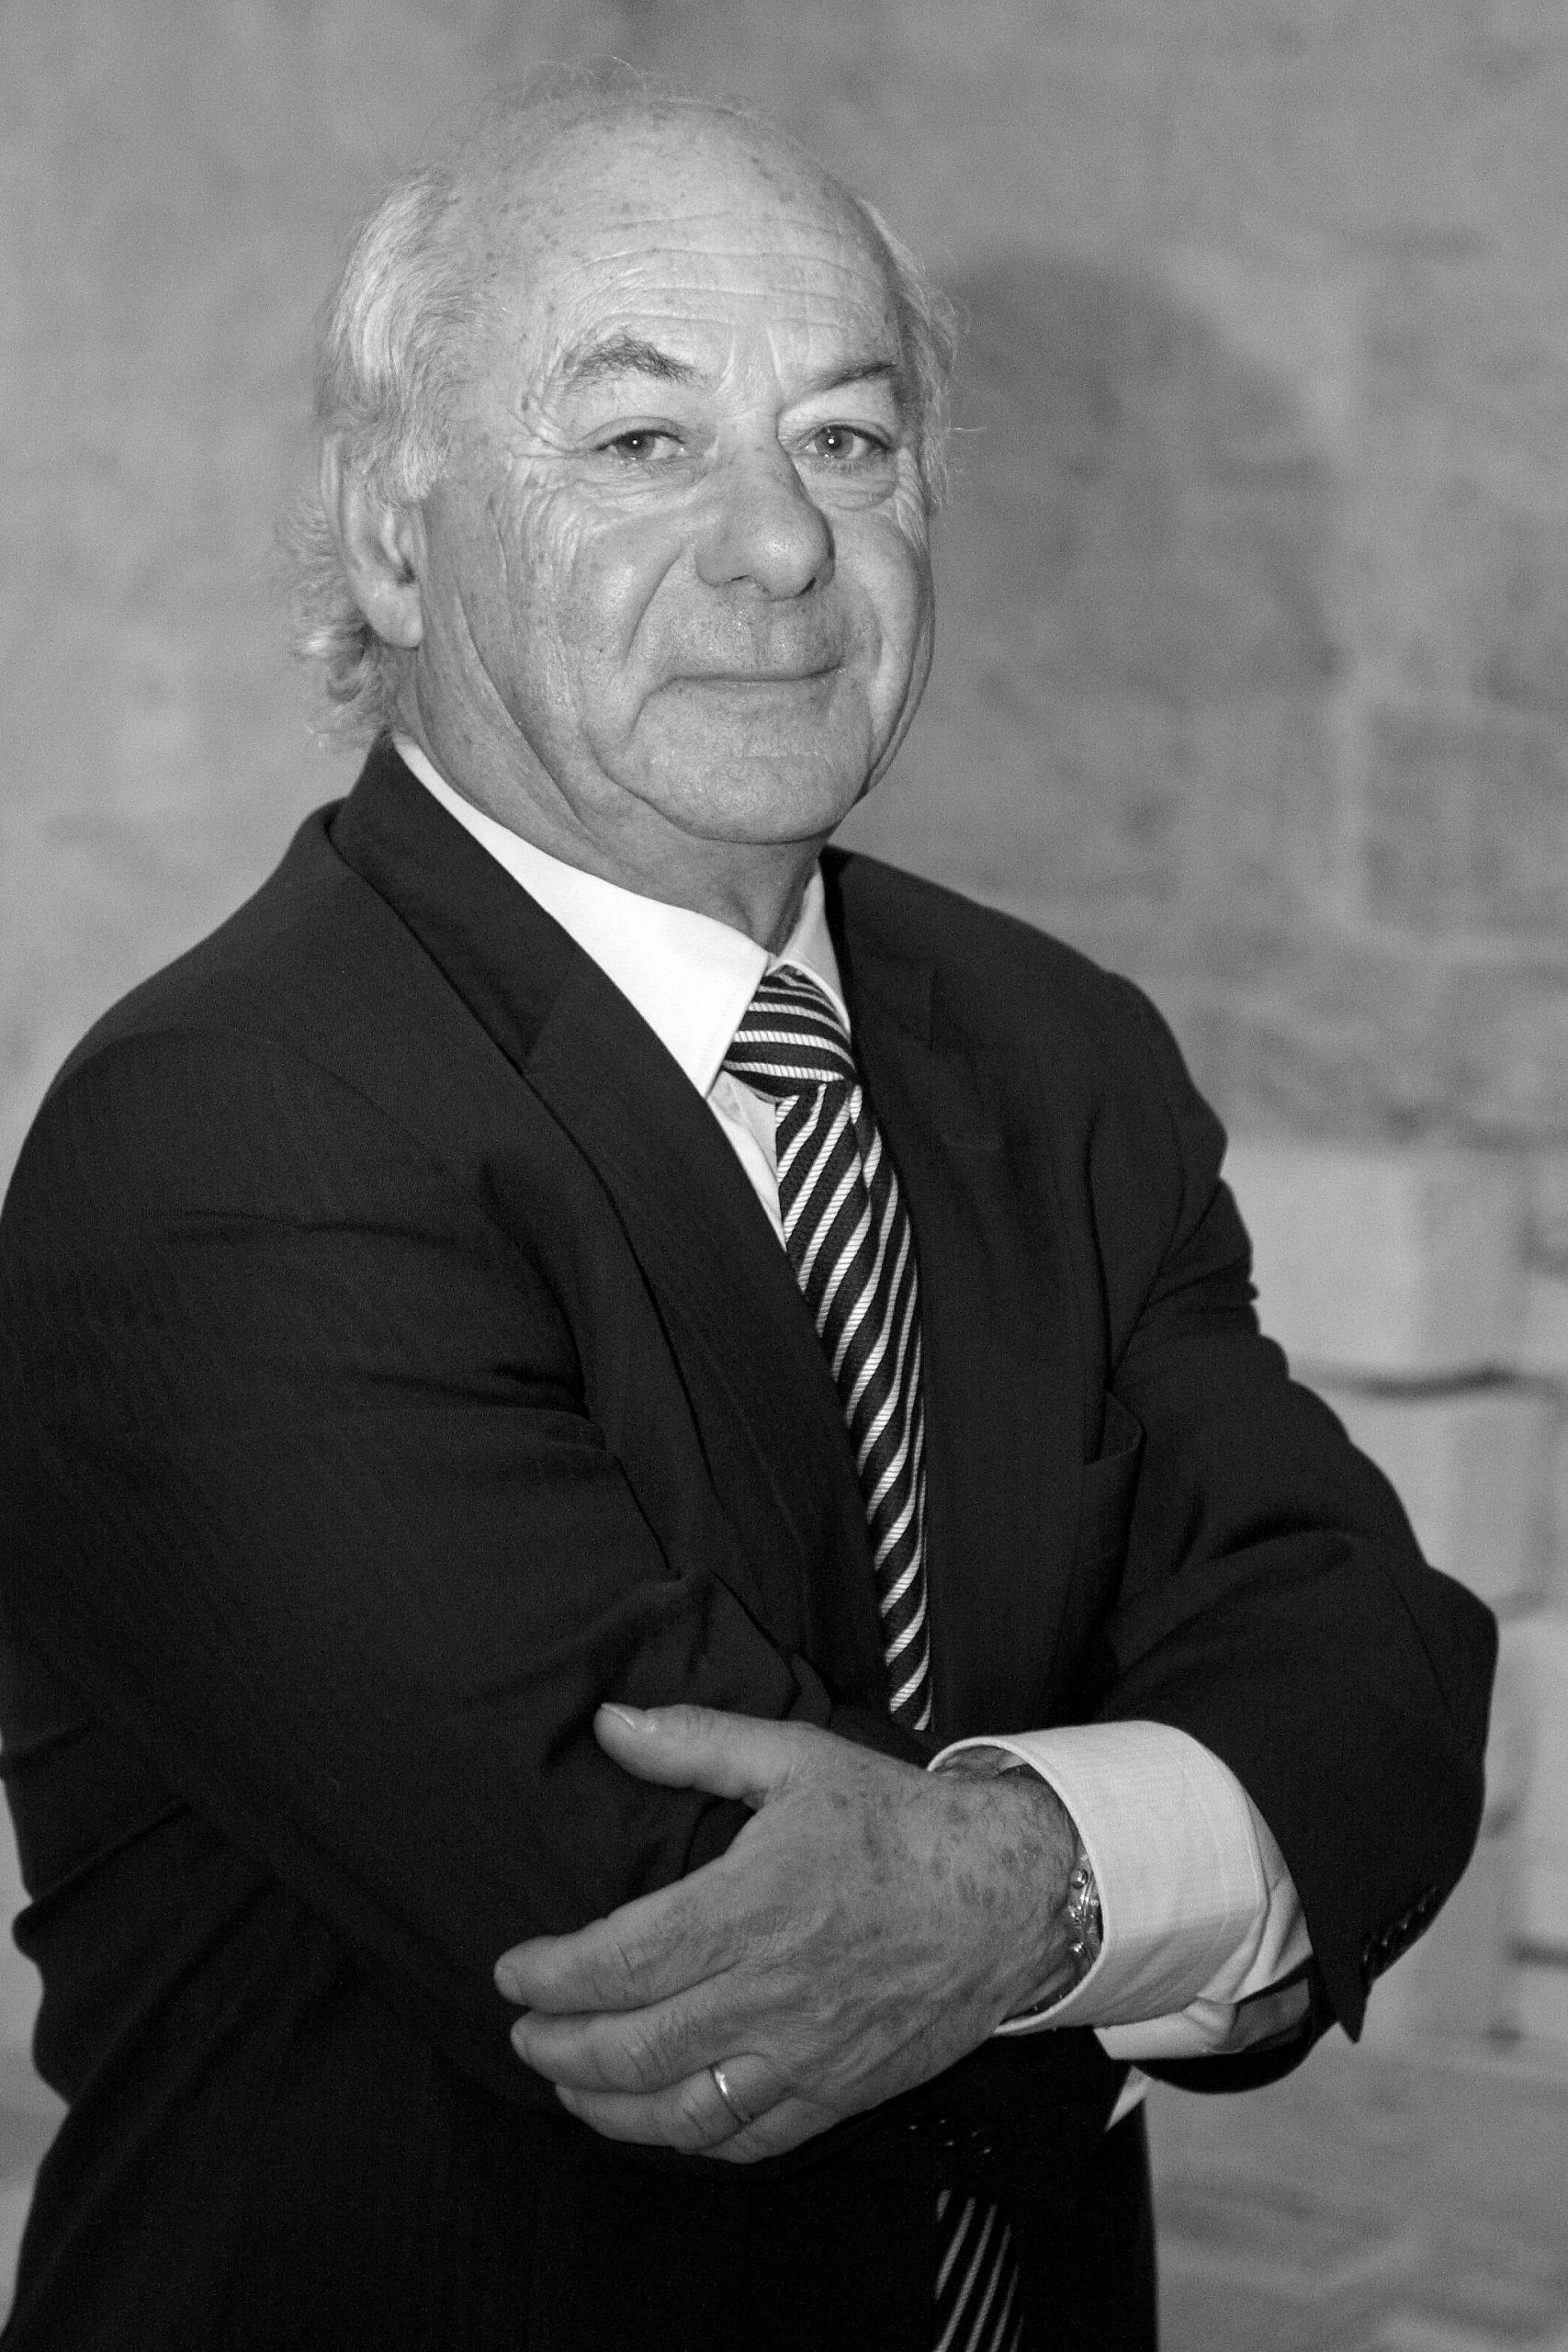 Jean-Jacques Lascombes